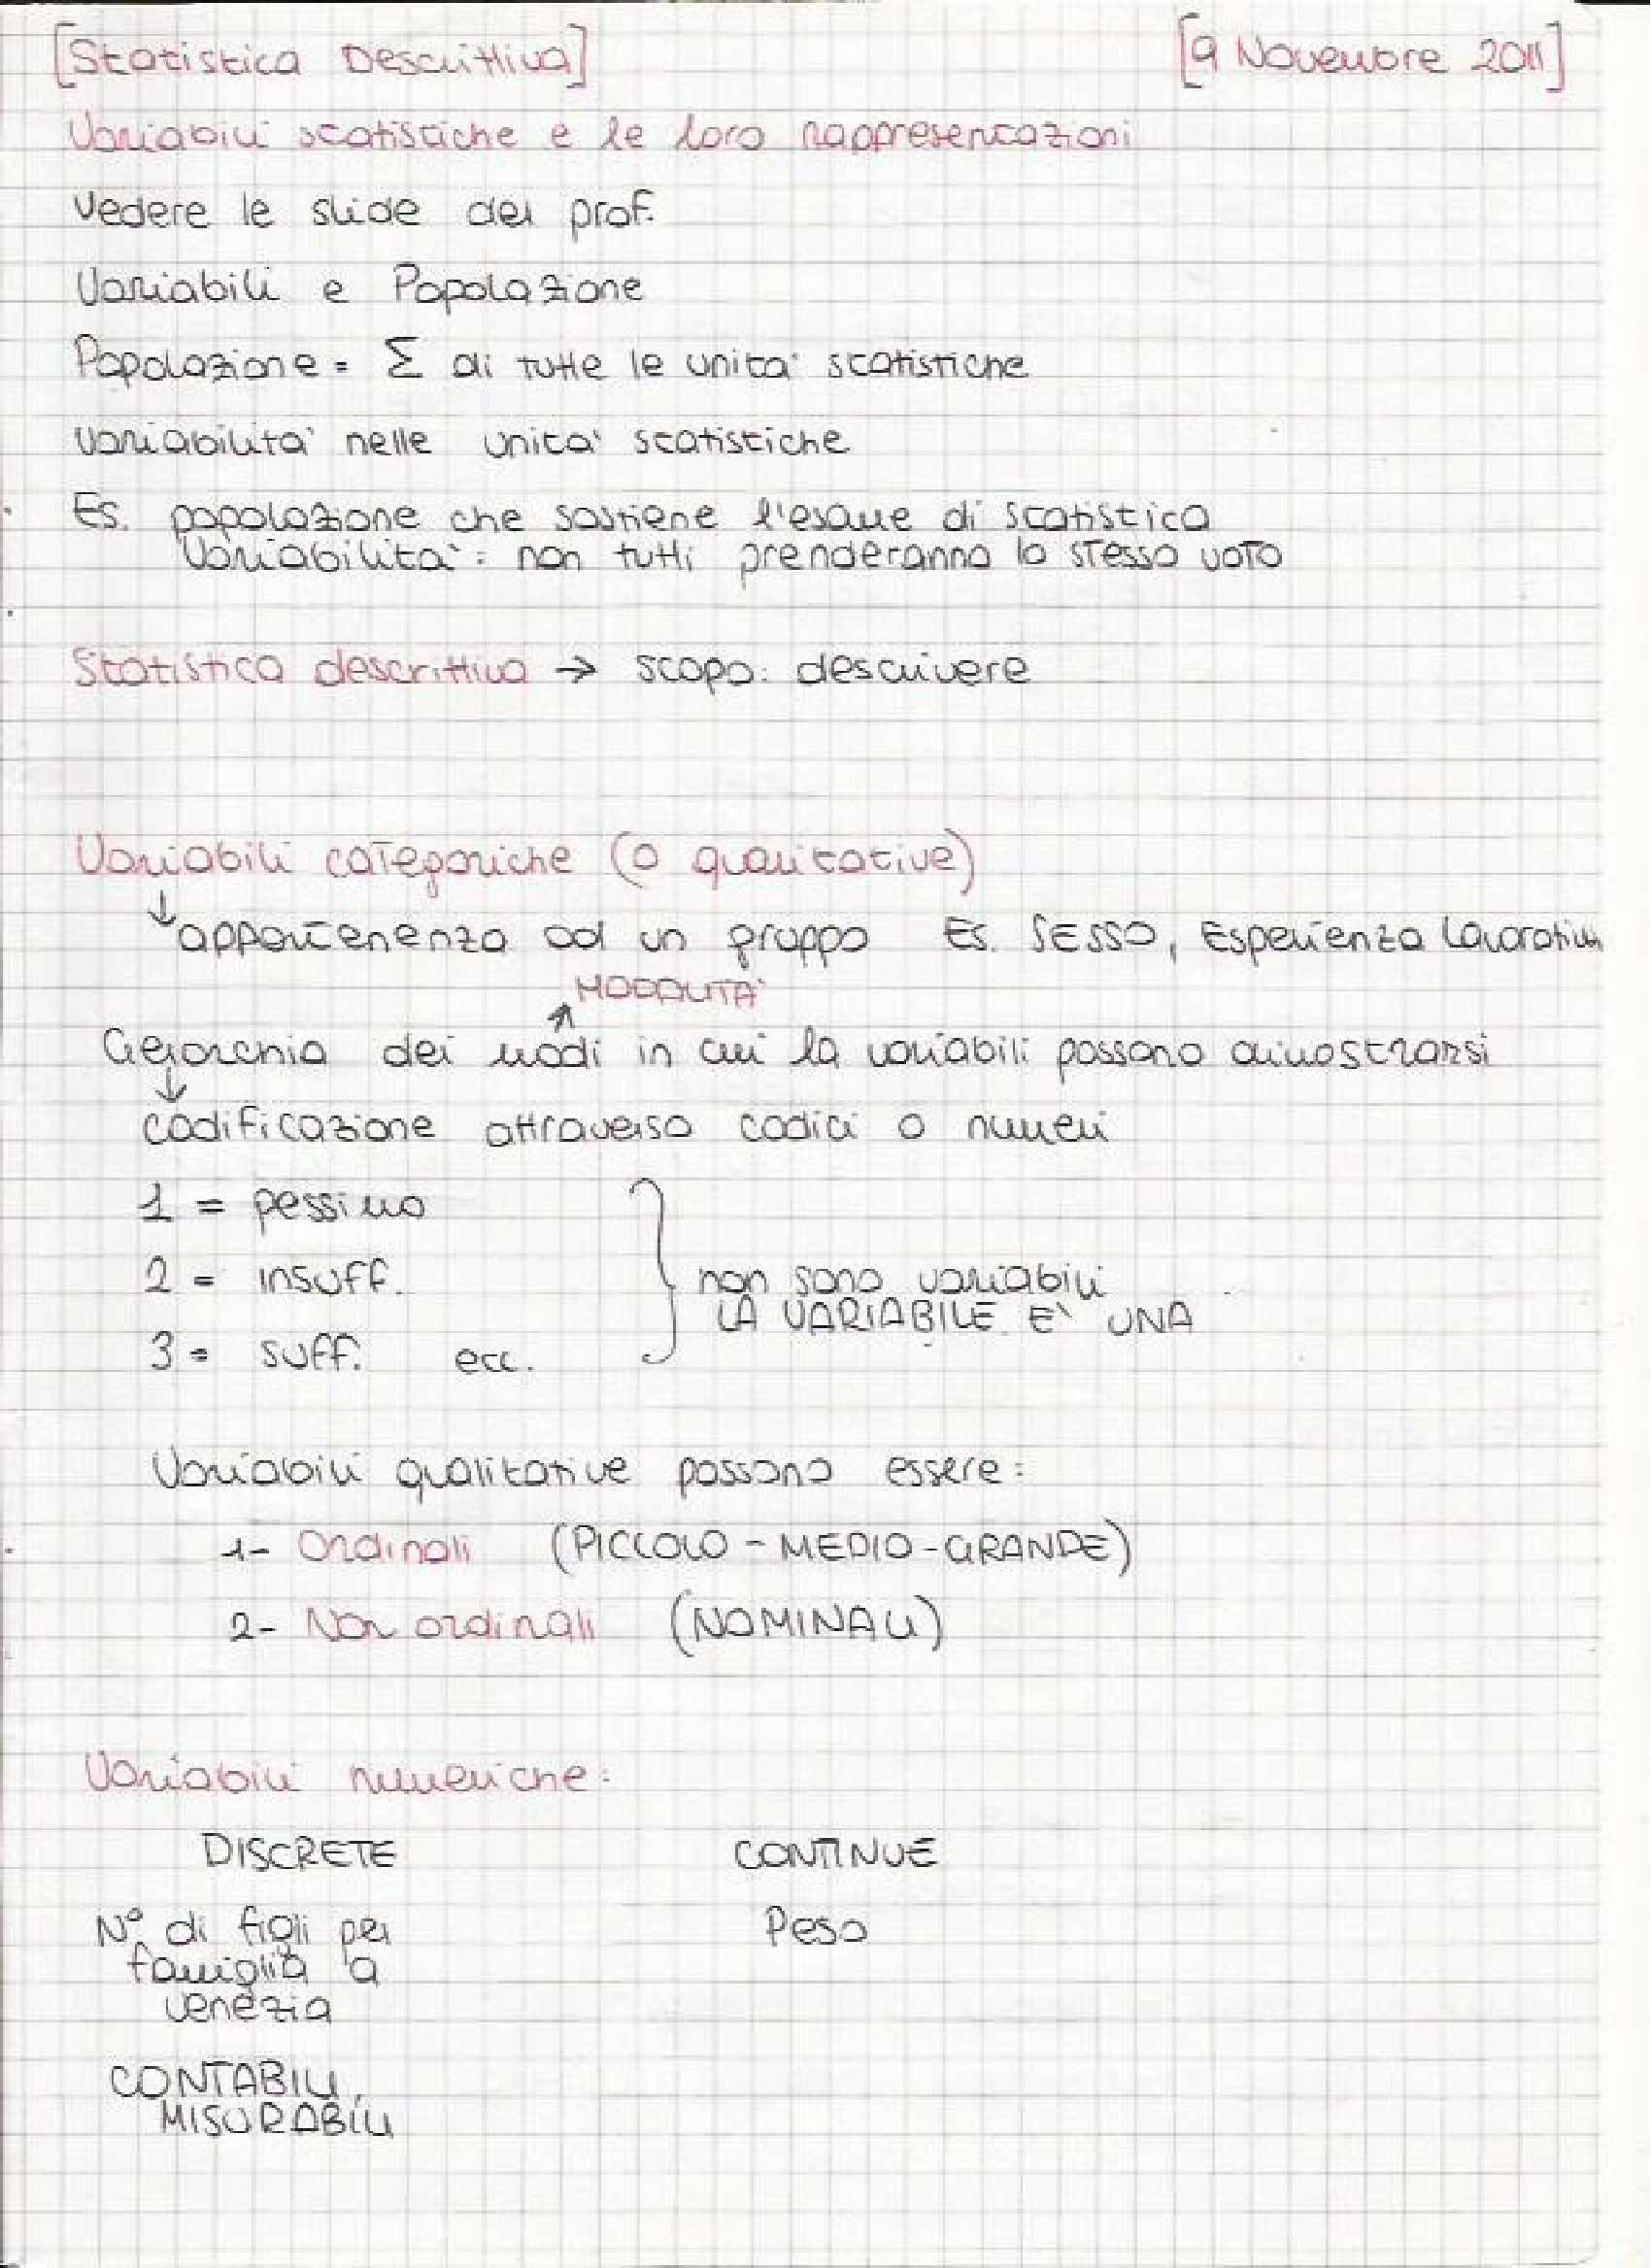 Statistica parte 2 - Appunti e Esercizi